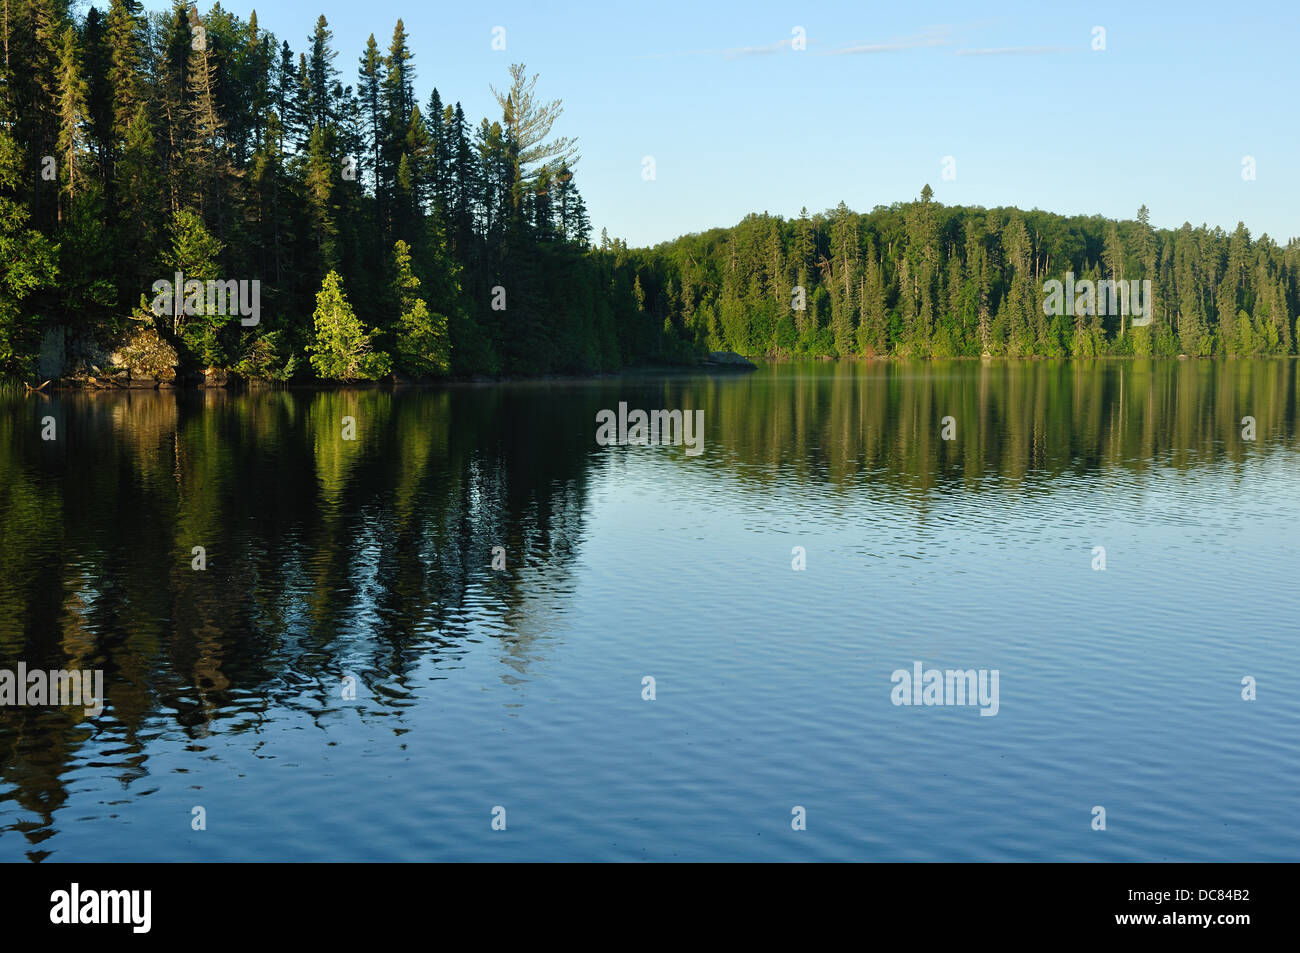 Lake in Boundary Waters Canoe Area, Minnesota, USA - Stock Image